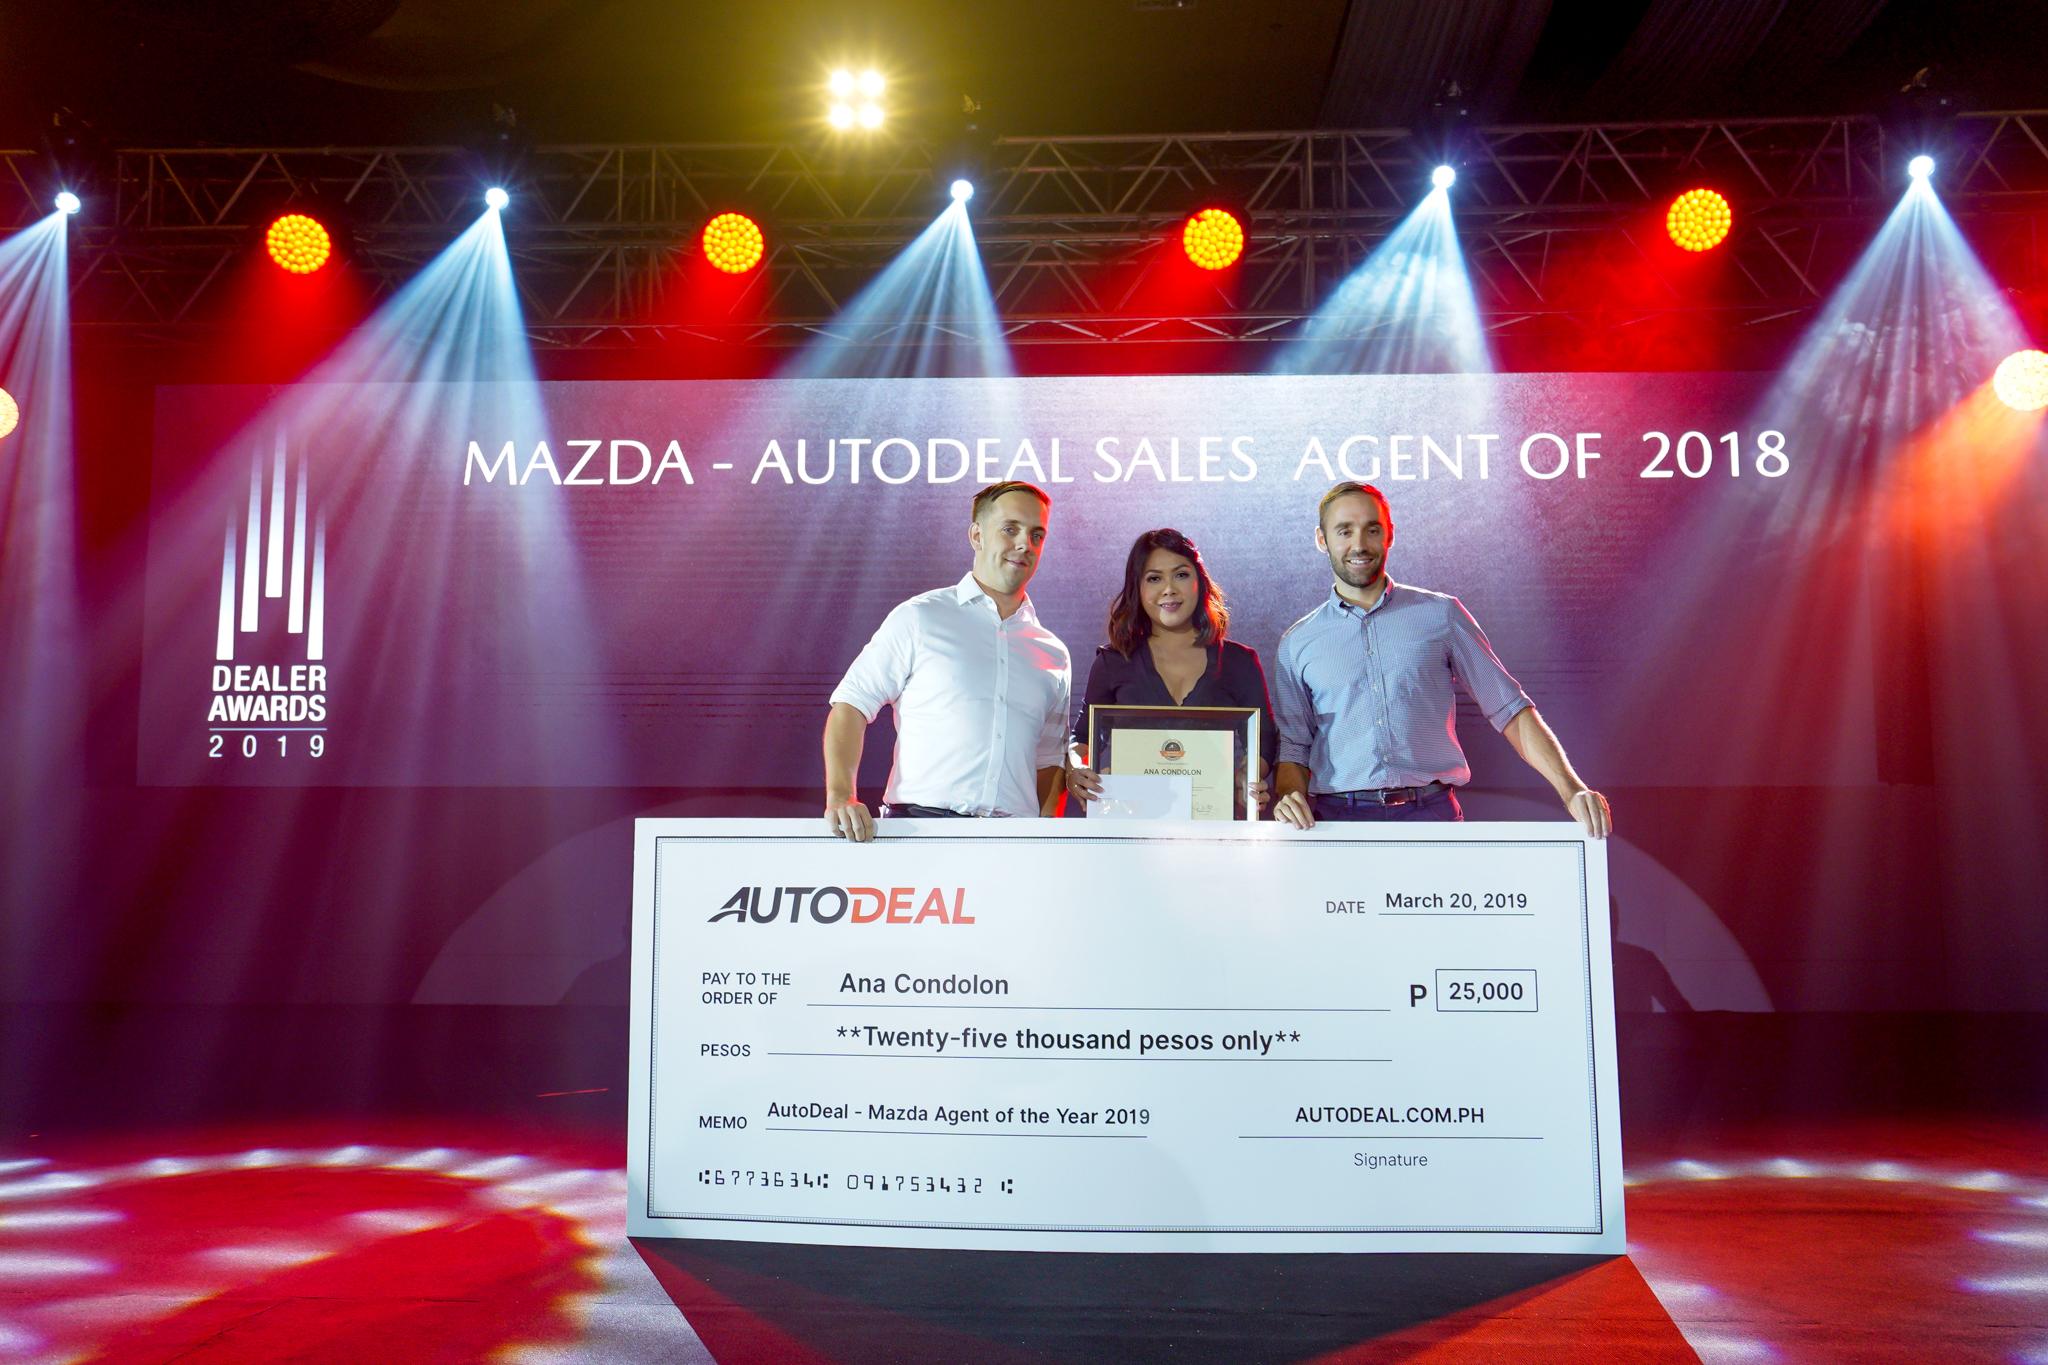 Ana Condolon - Mazda AutoDeal Agent of the Year 2018